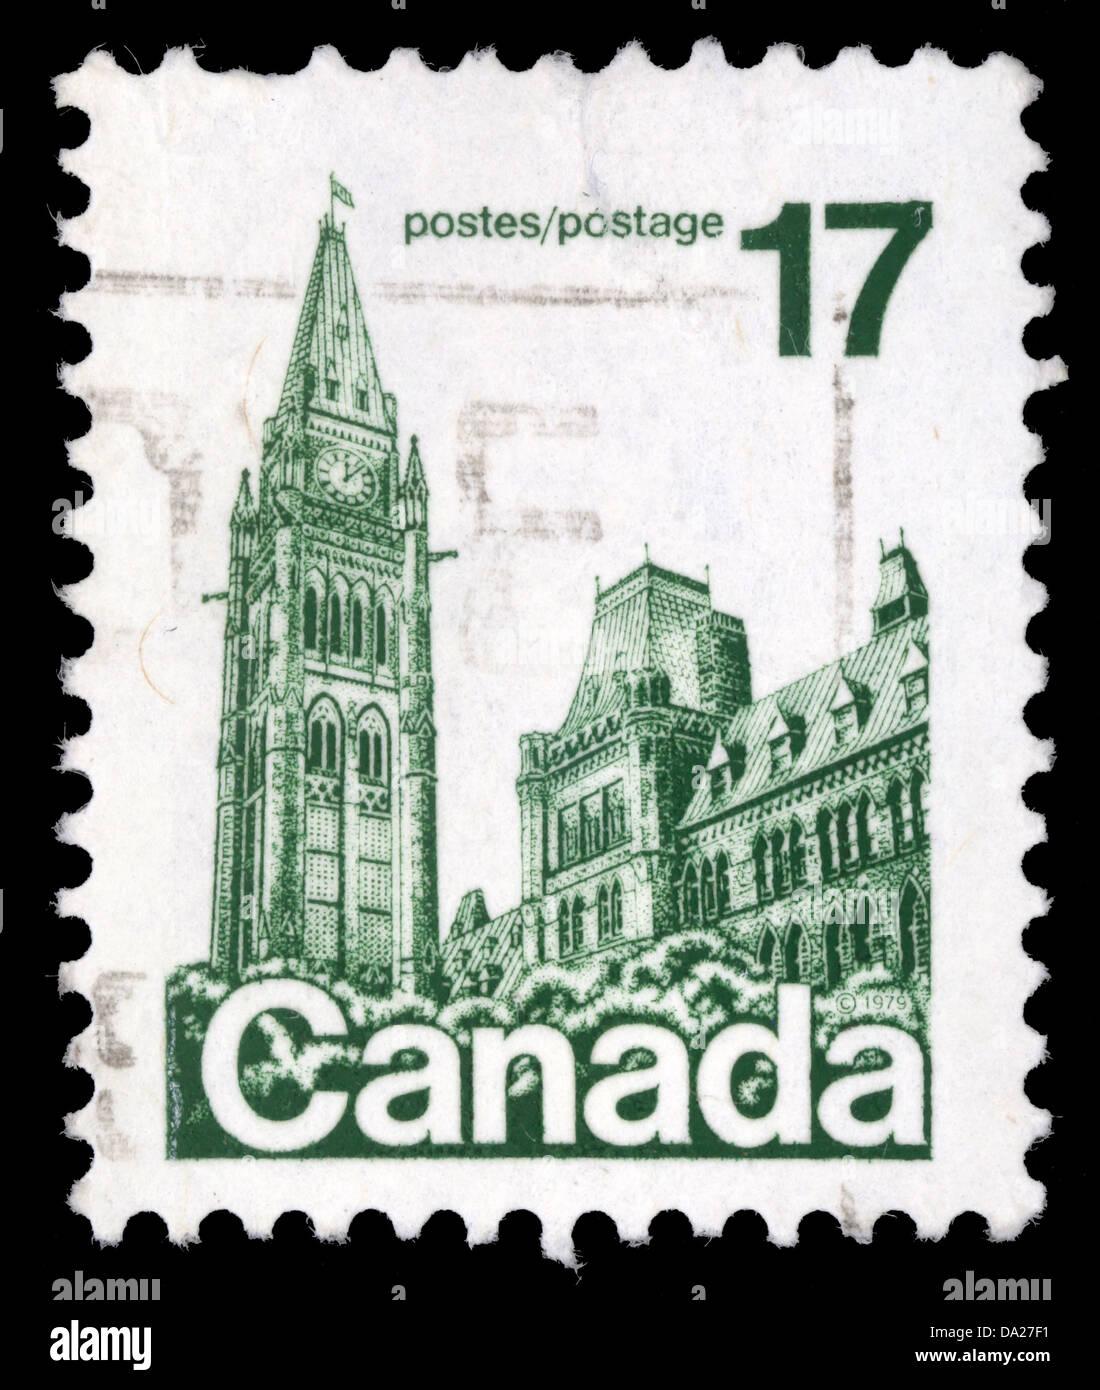 CANADA - CIRCA 1977: A stamp printed in Canada shows Parliament Buildings, circa 1977 - Stock Image